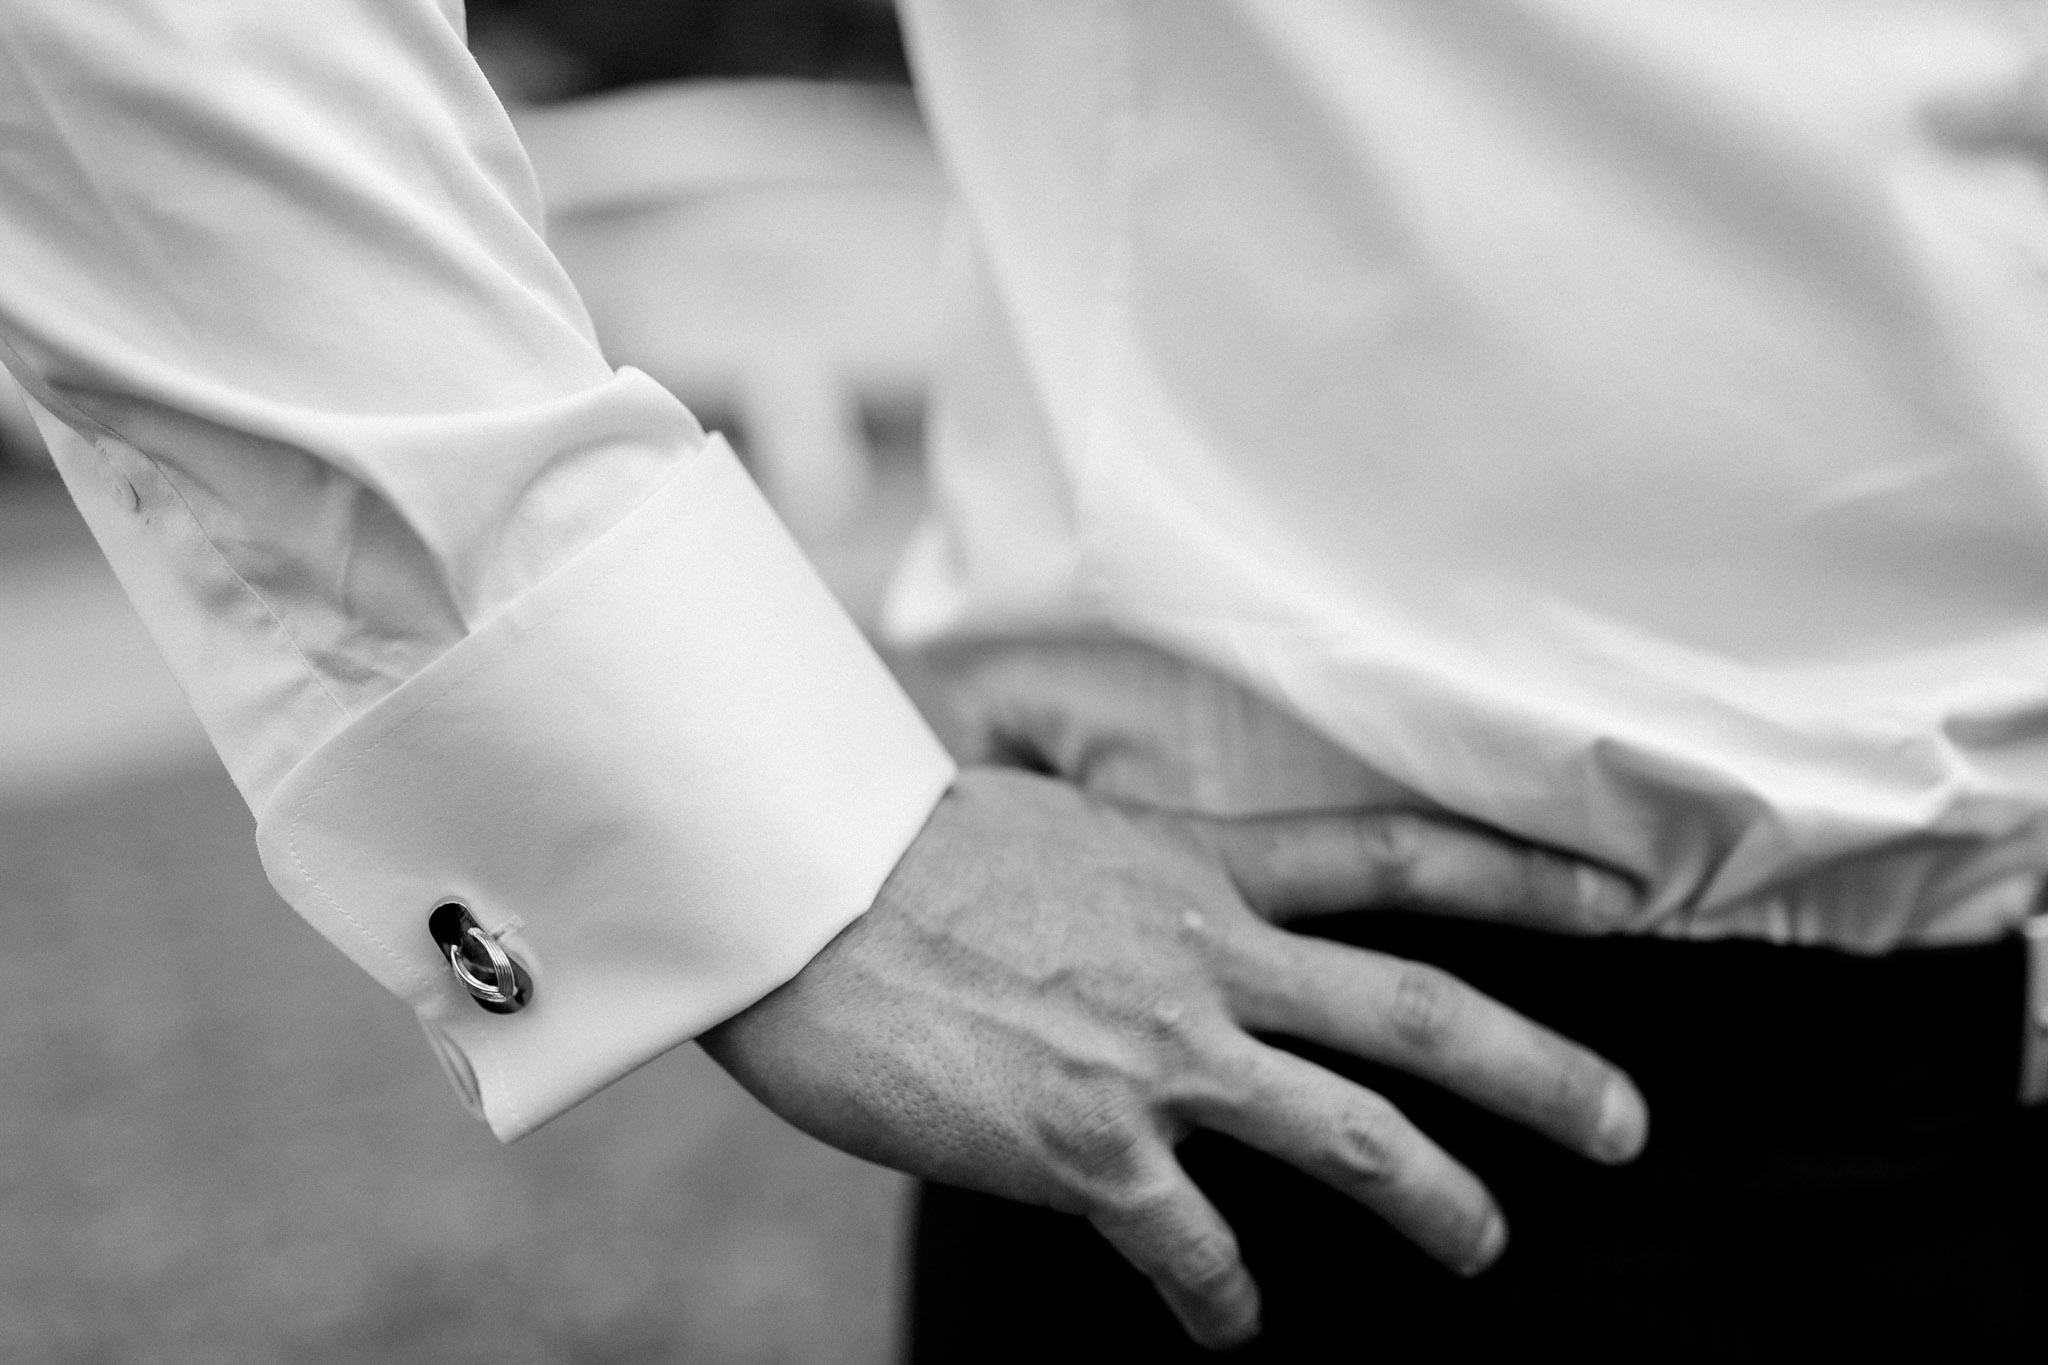 Lenl-Simmental-Buehlerhof-Pia-Anna-Christian-Wedding-Photography-EK-20.jpg